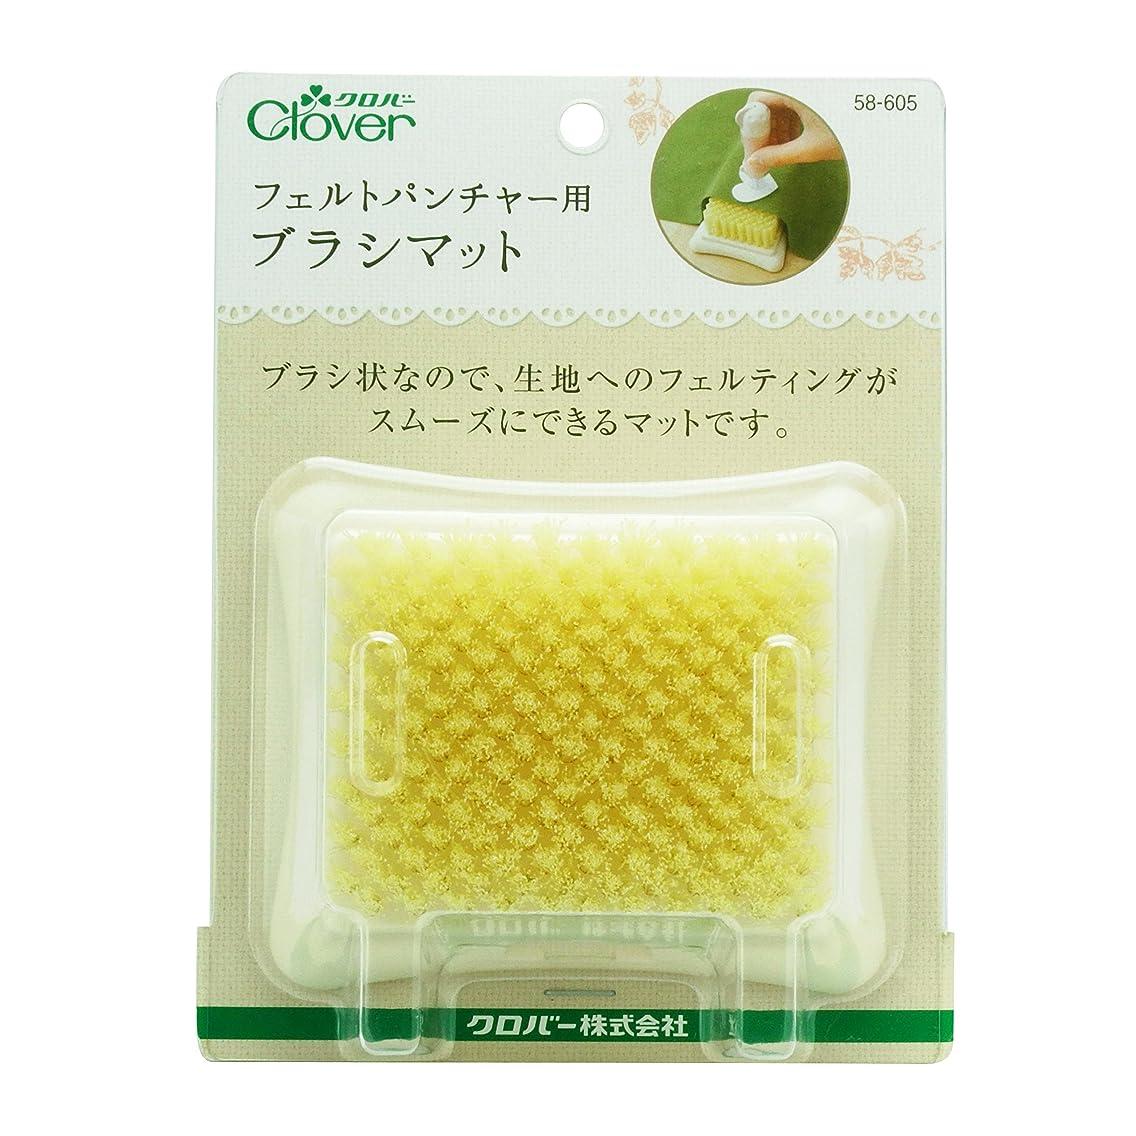 Clover felt puncher brush mat 58-605